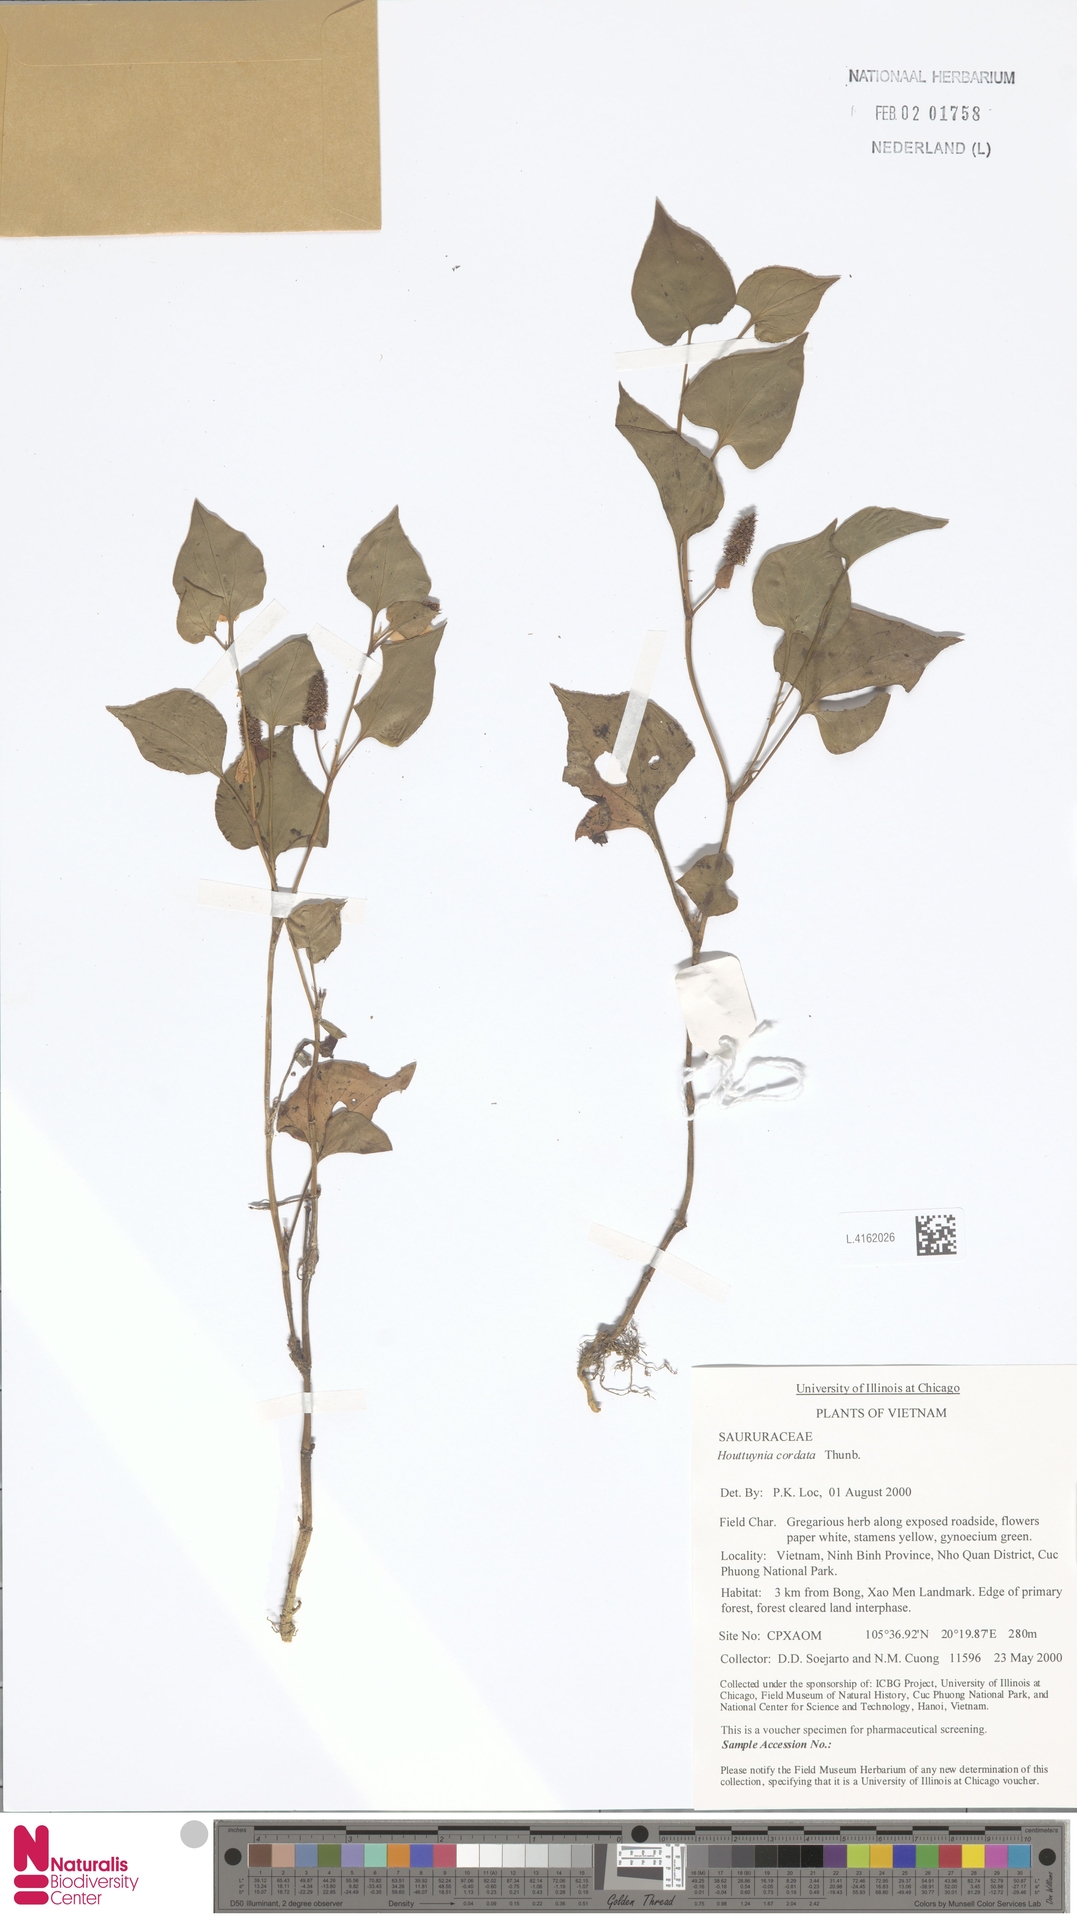 L.4162026   Houttuynia cordata Thunb.